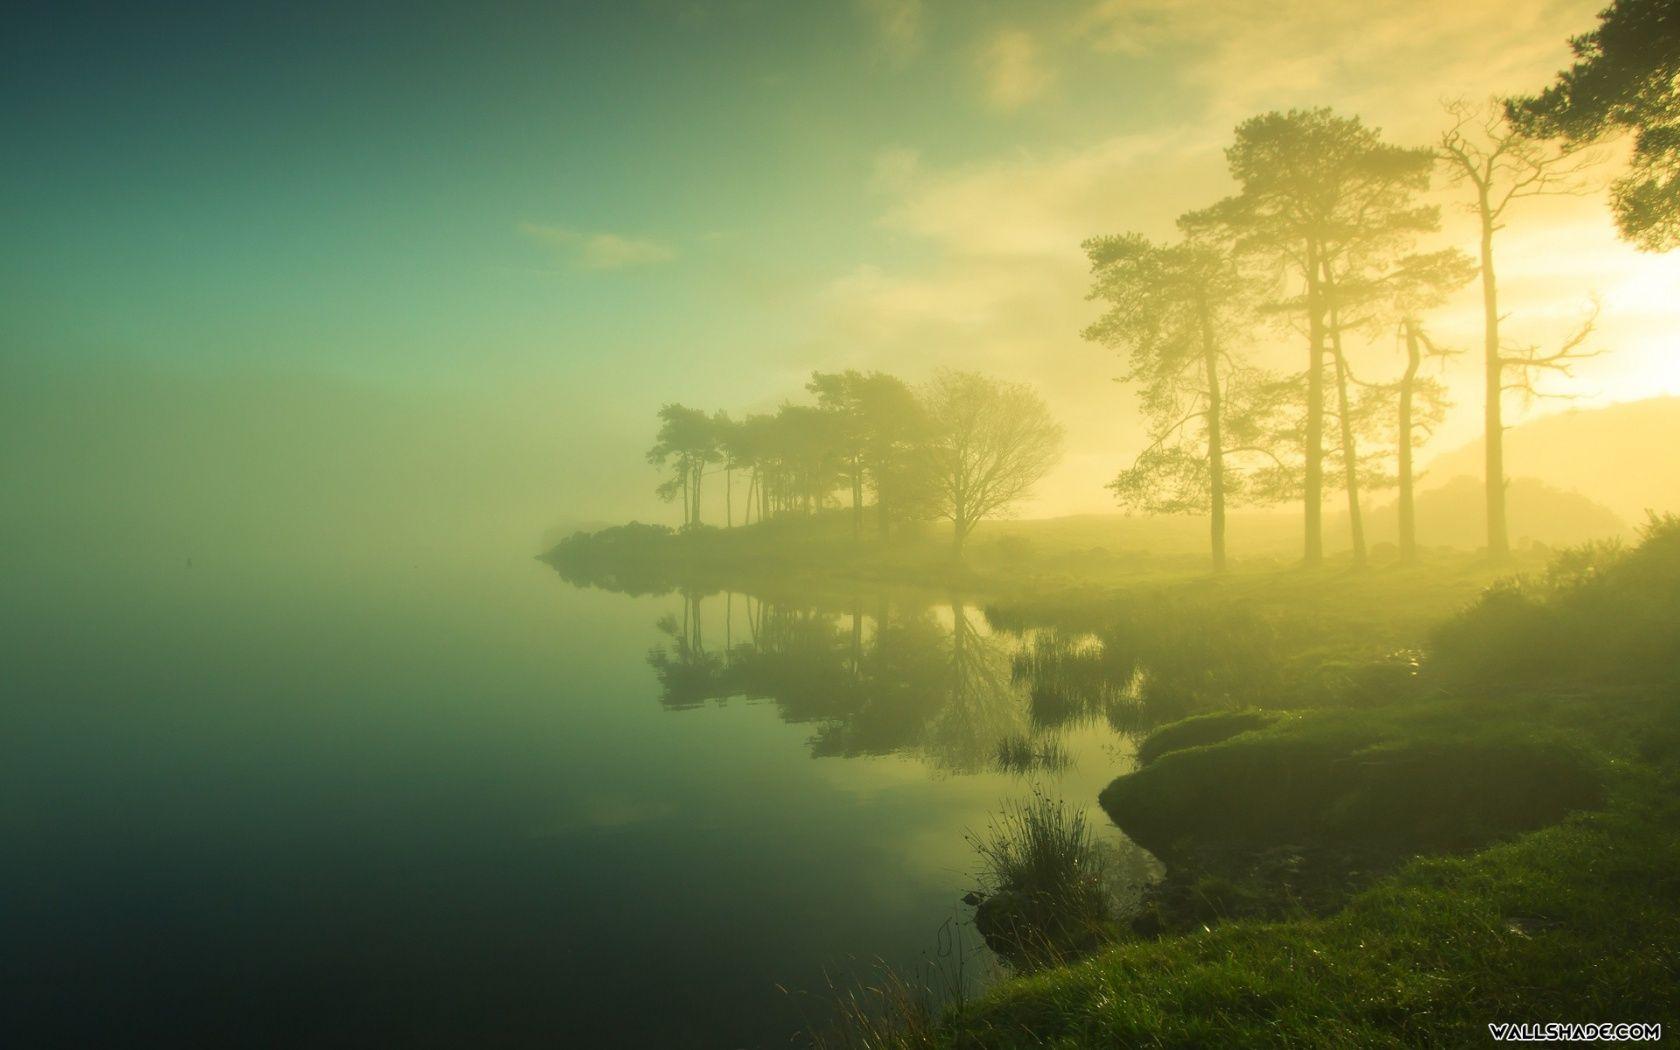 Free Foggy Lake Desktop Wallpaper 16801050 Scenery Nature Good Morning Images Hd wallpaper morning lake trees fog